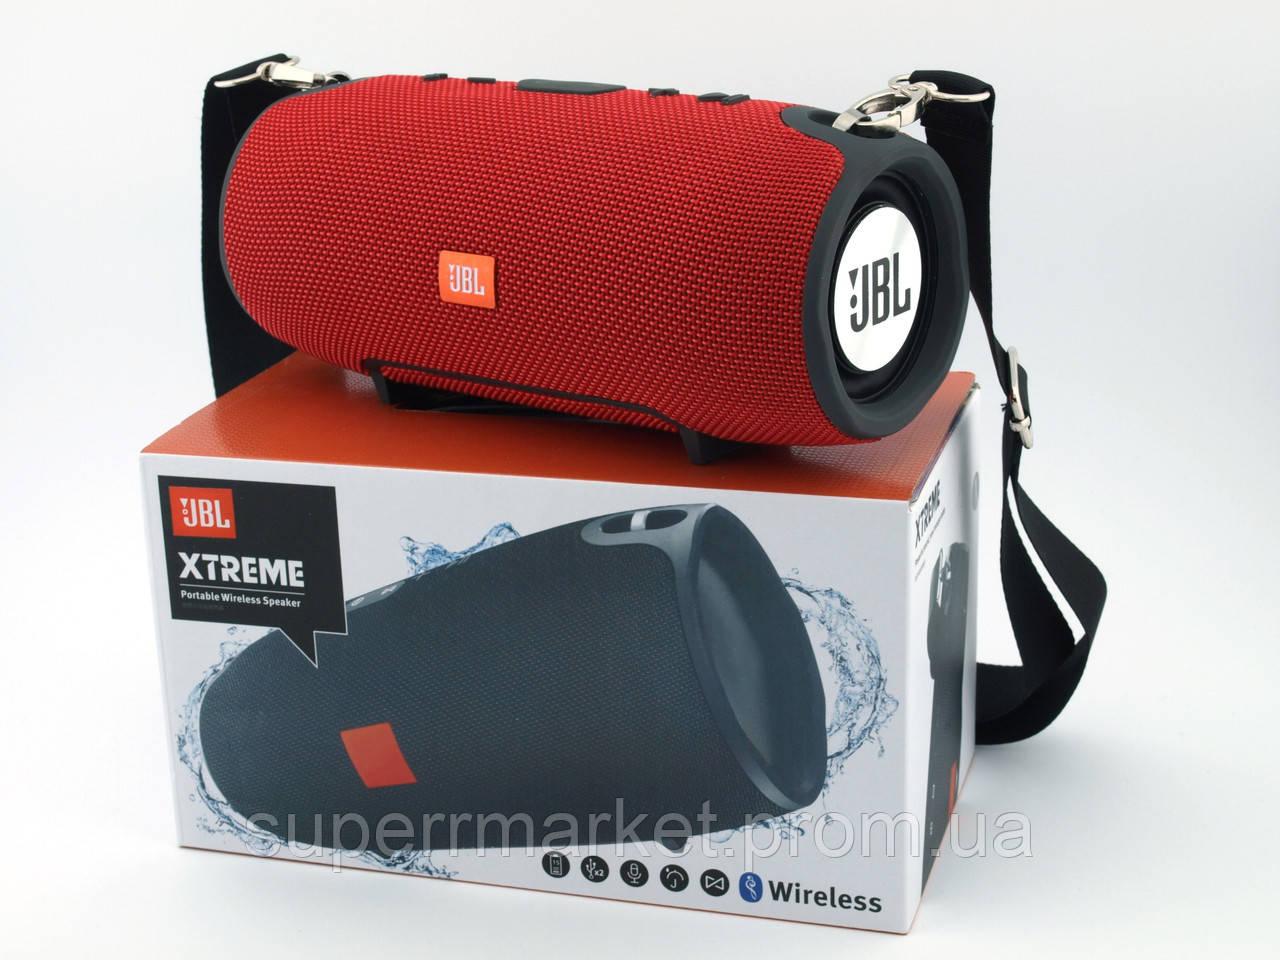 JBL XTREME 13 small портативная колонка 40W с Bluetooth FM MP3 копия, красная